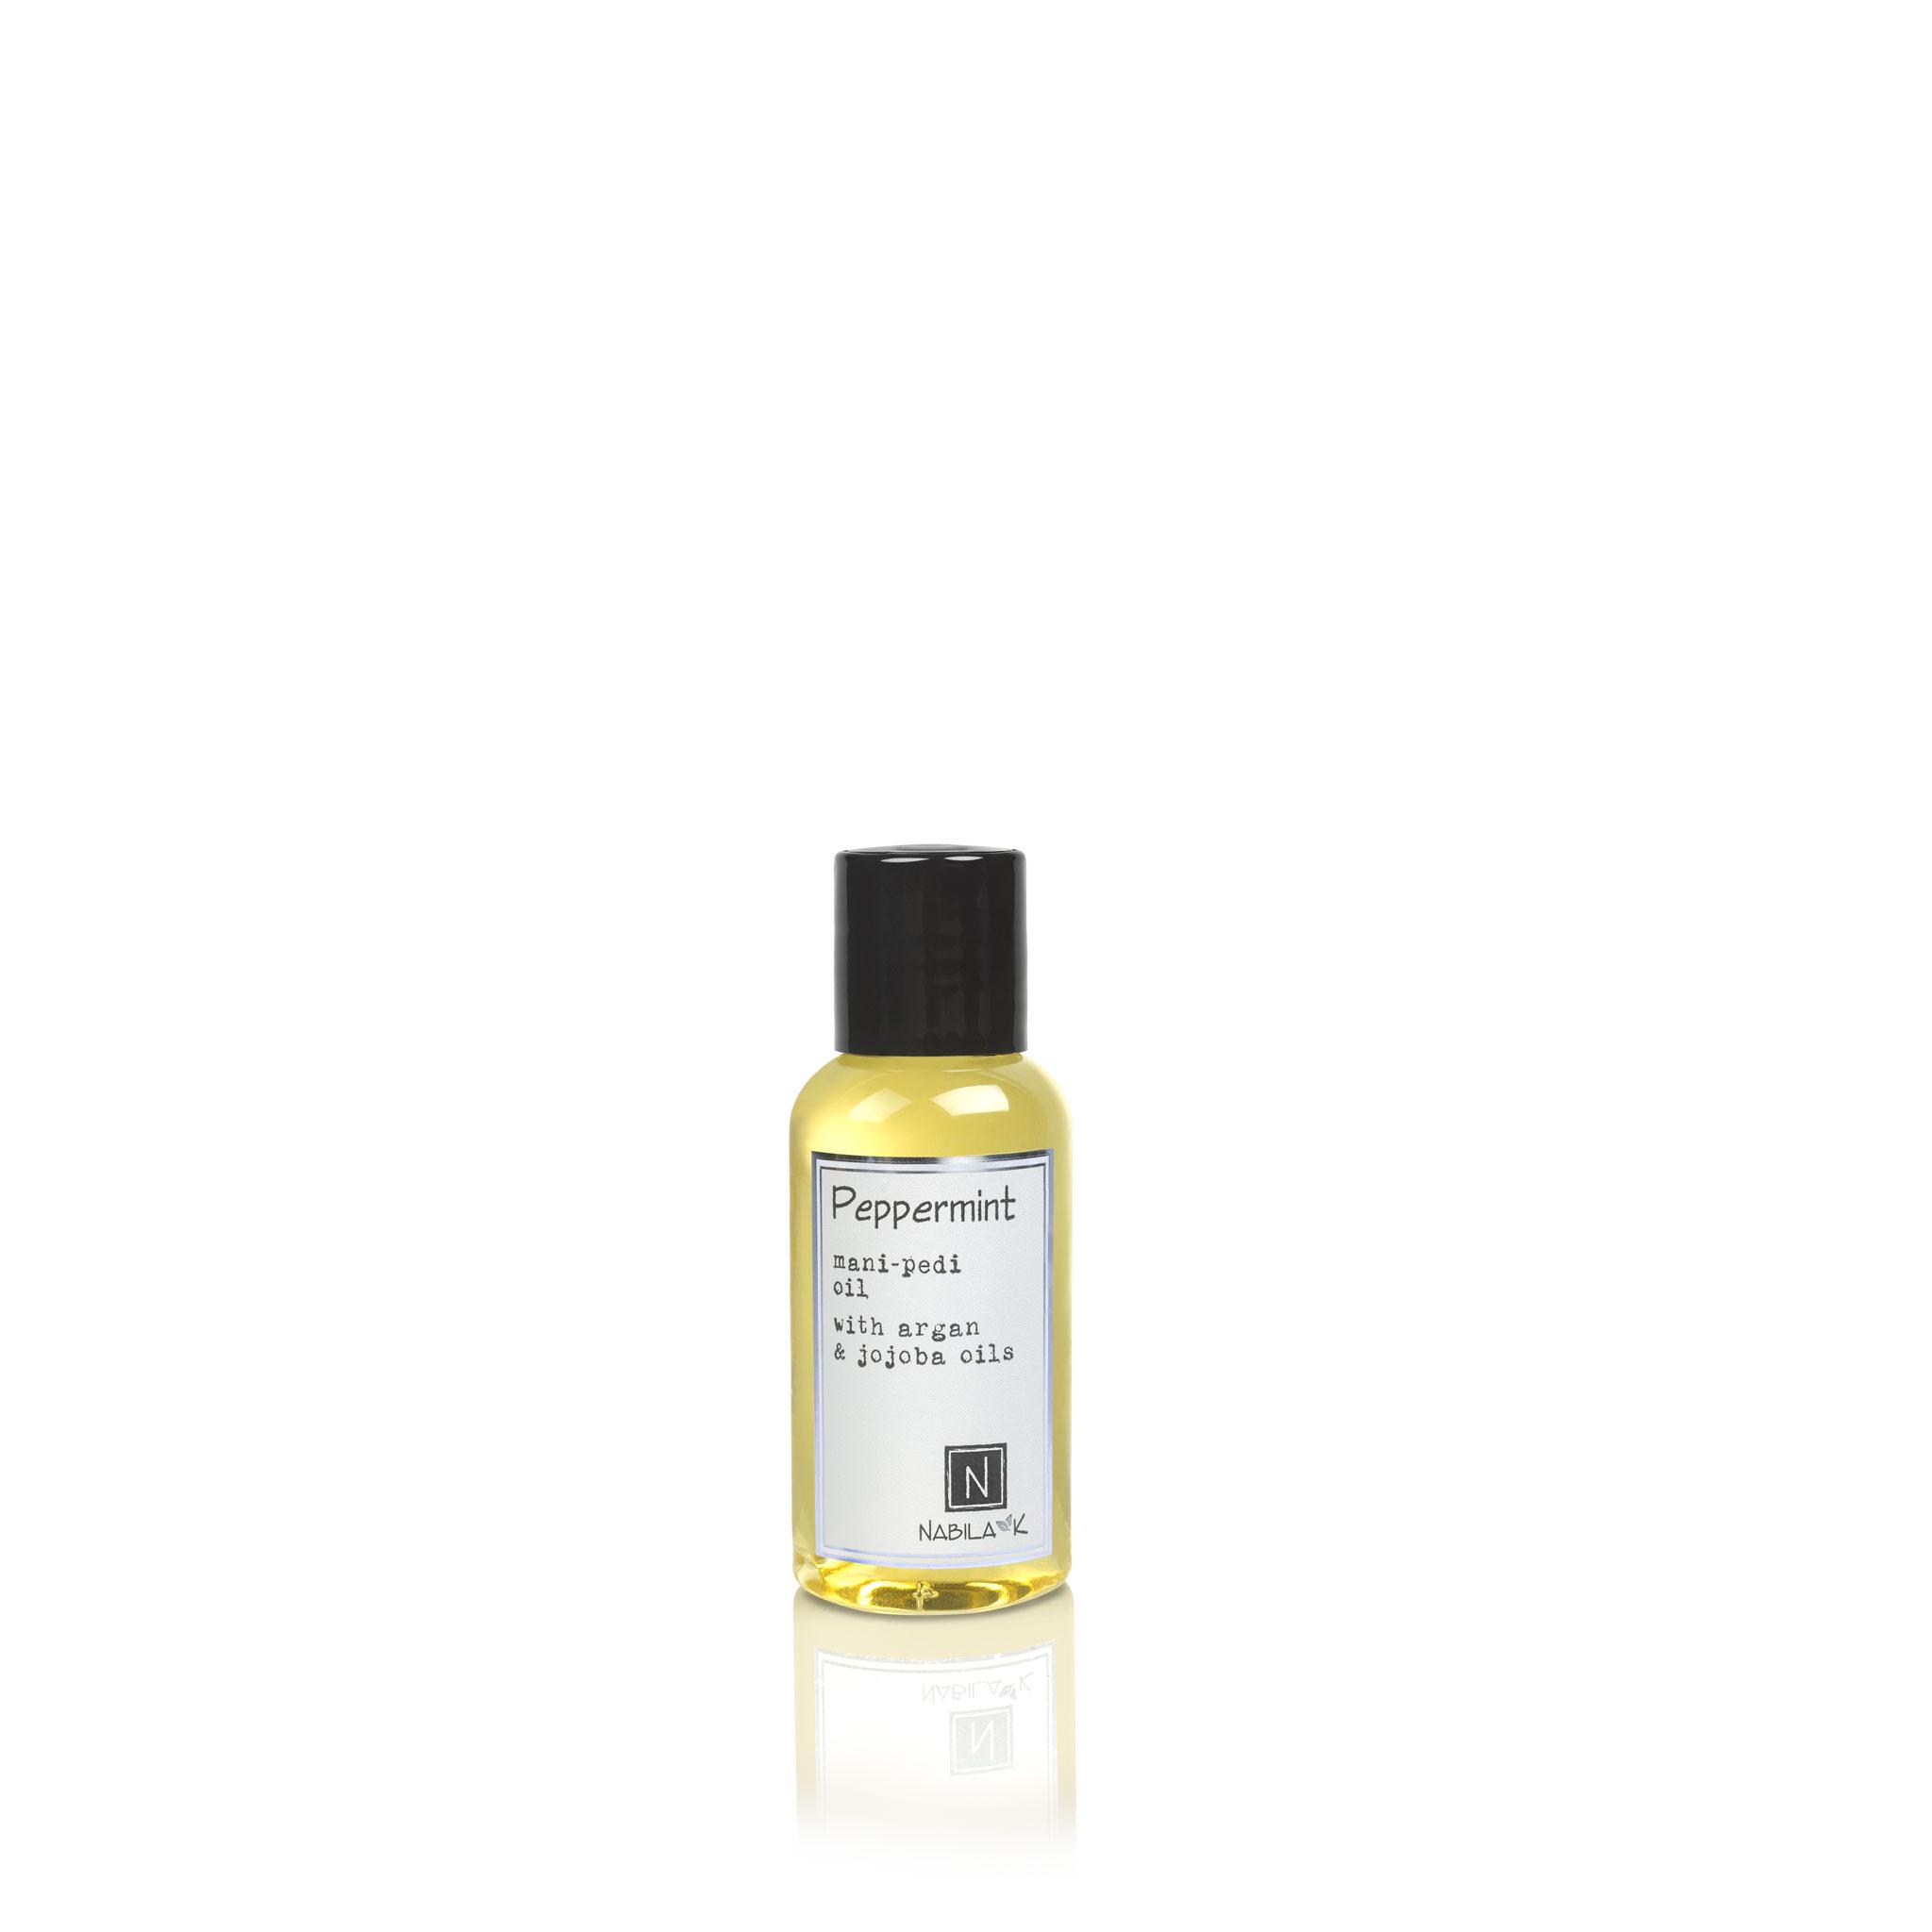 1 Travel Size Version of Peppermint Mani-Pedi Oil with Argan and Jojoba Oils